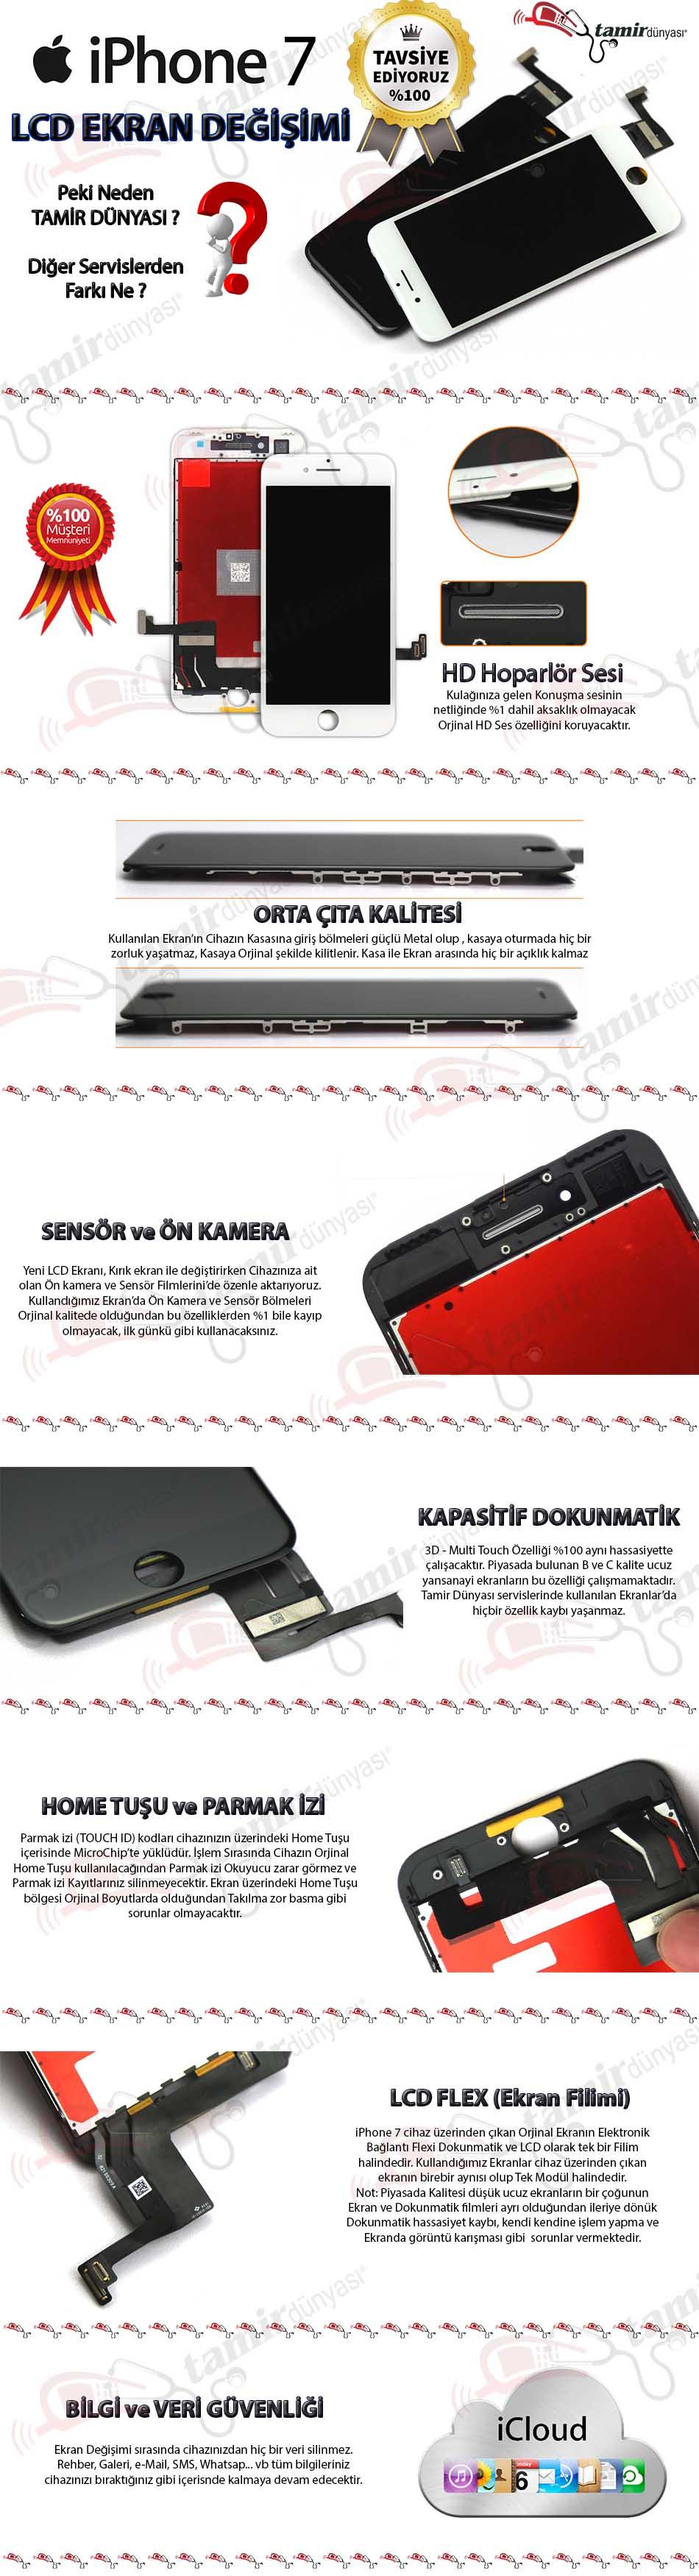 iphone7ekran